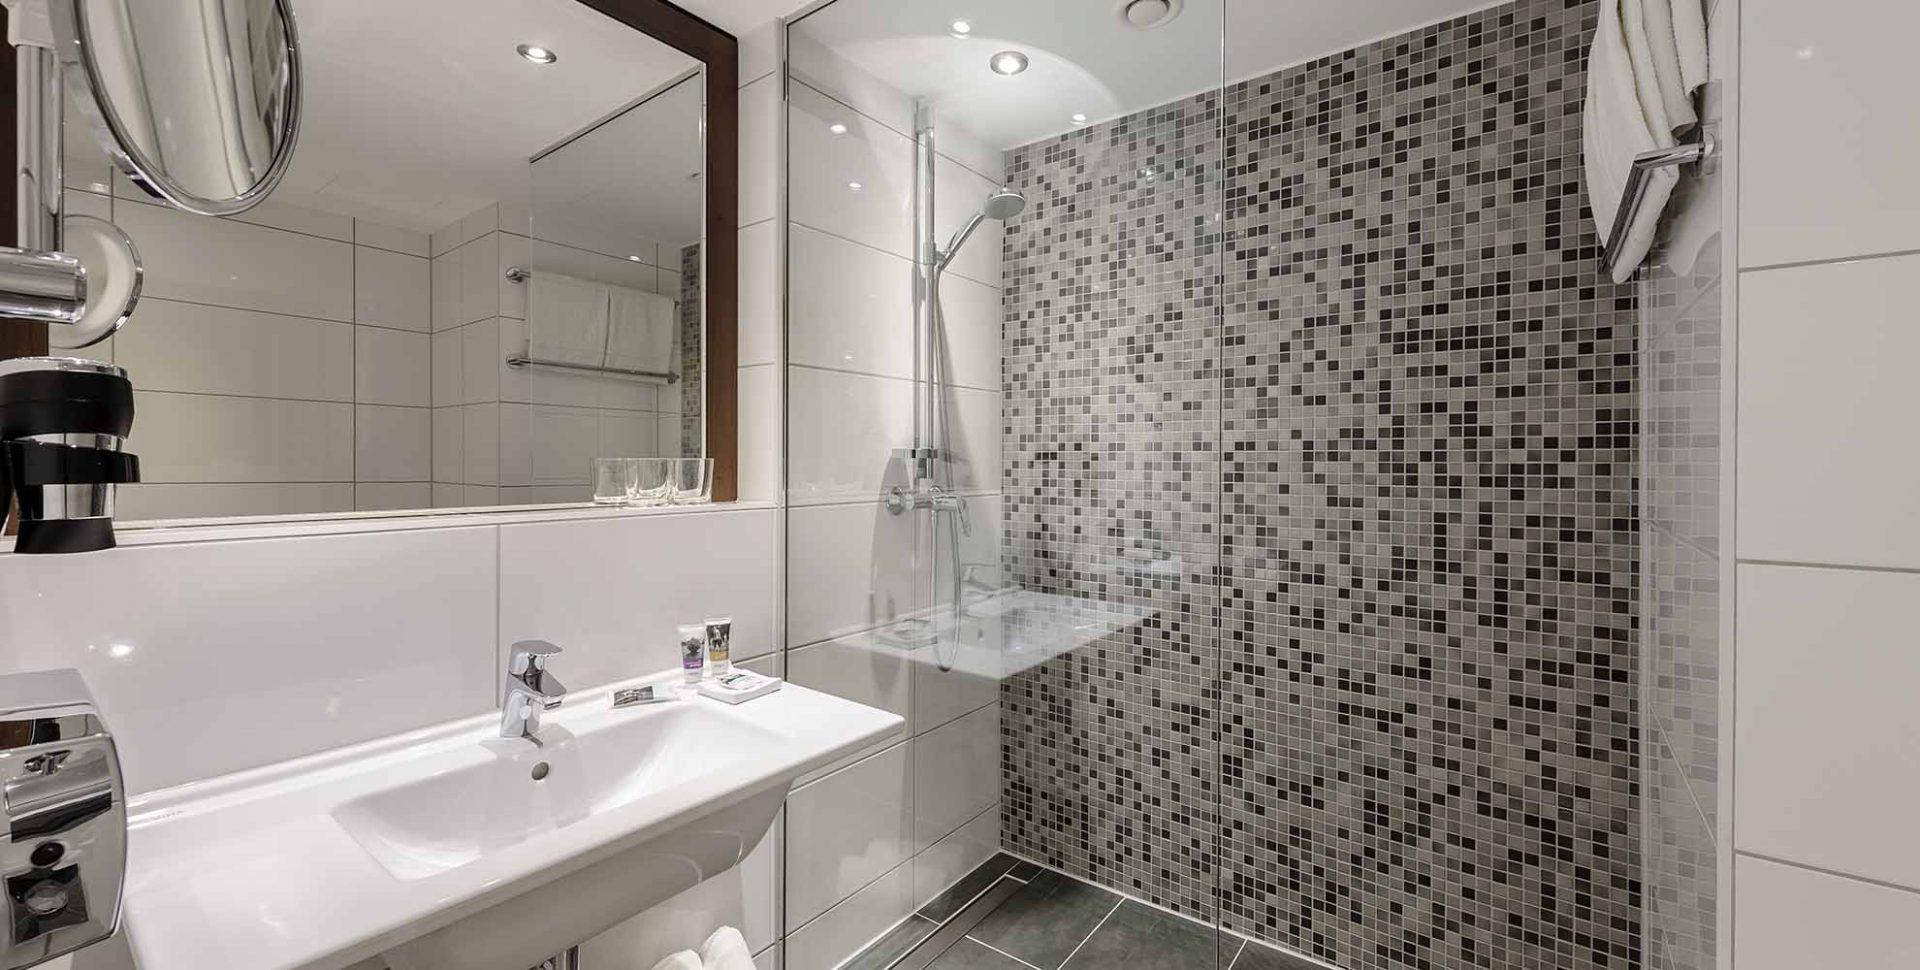 Chio aachen 2018 mercure hotel aachen europaplatz - Badezimmer aachen ...